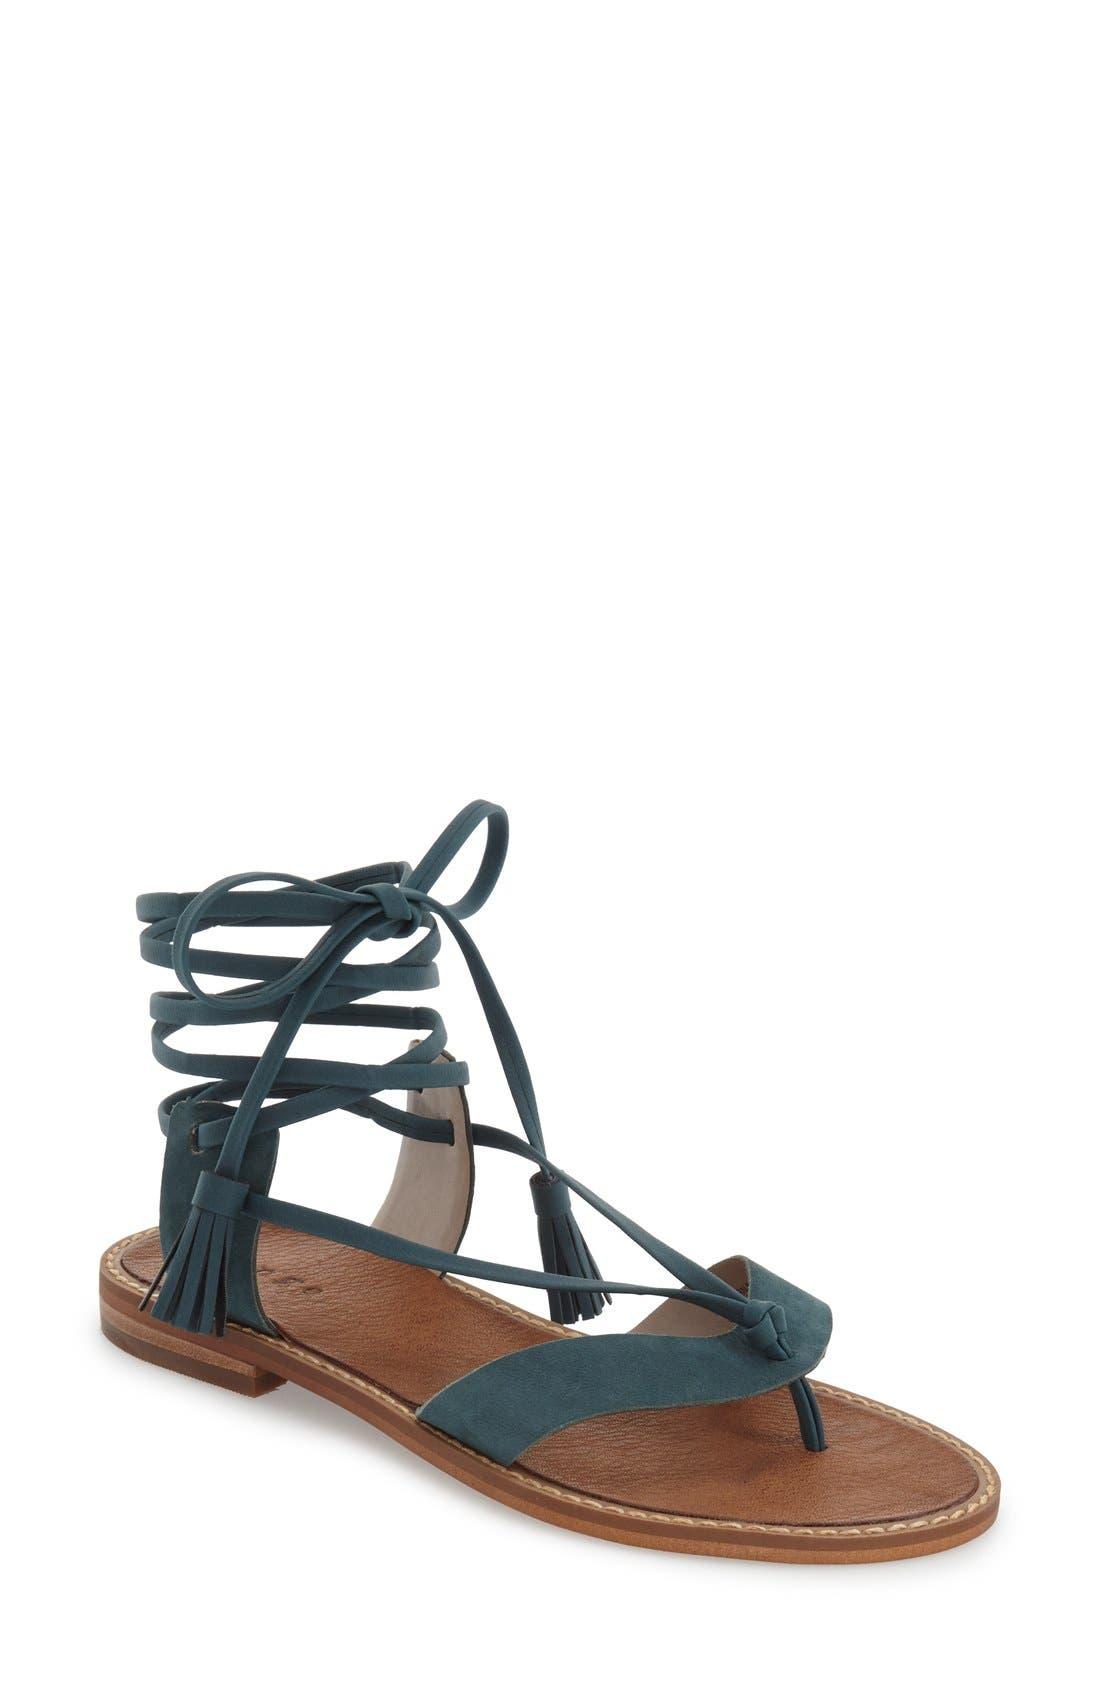 Alternate Image 1 Selected - Hinge 'Avery' Wraparound Strap Sandal (Women)